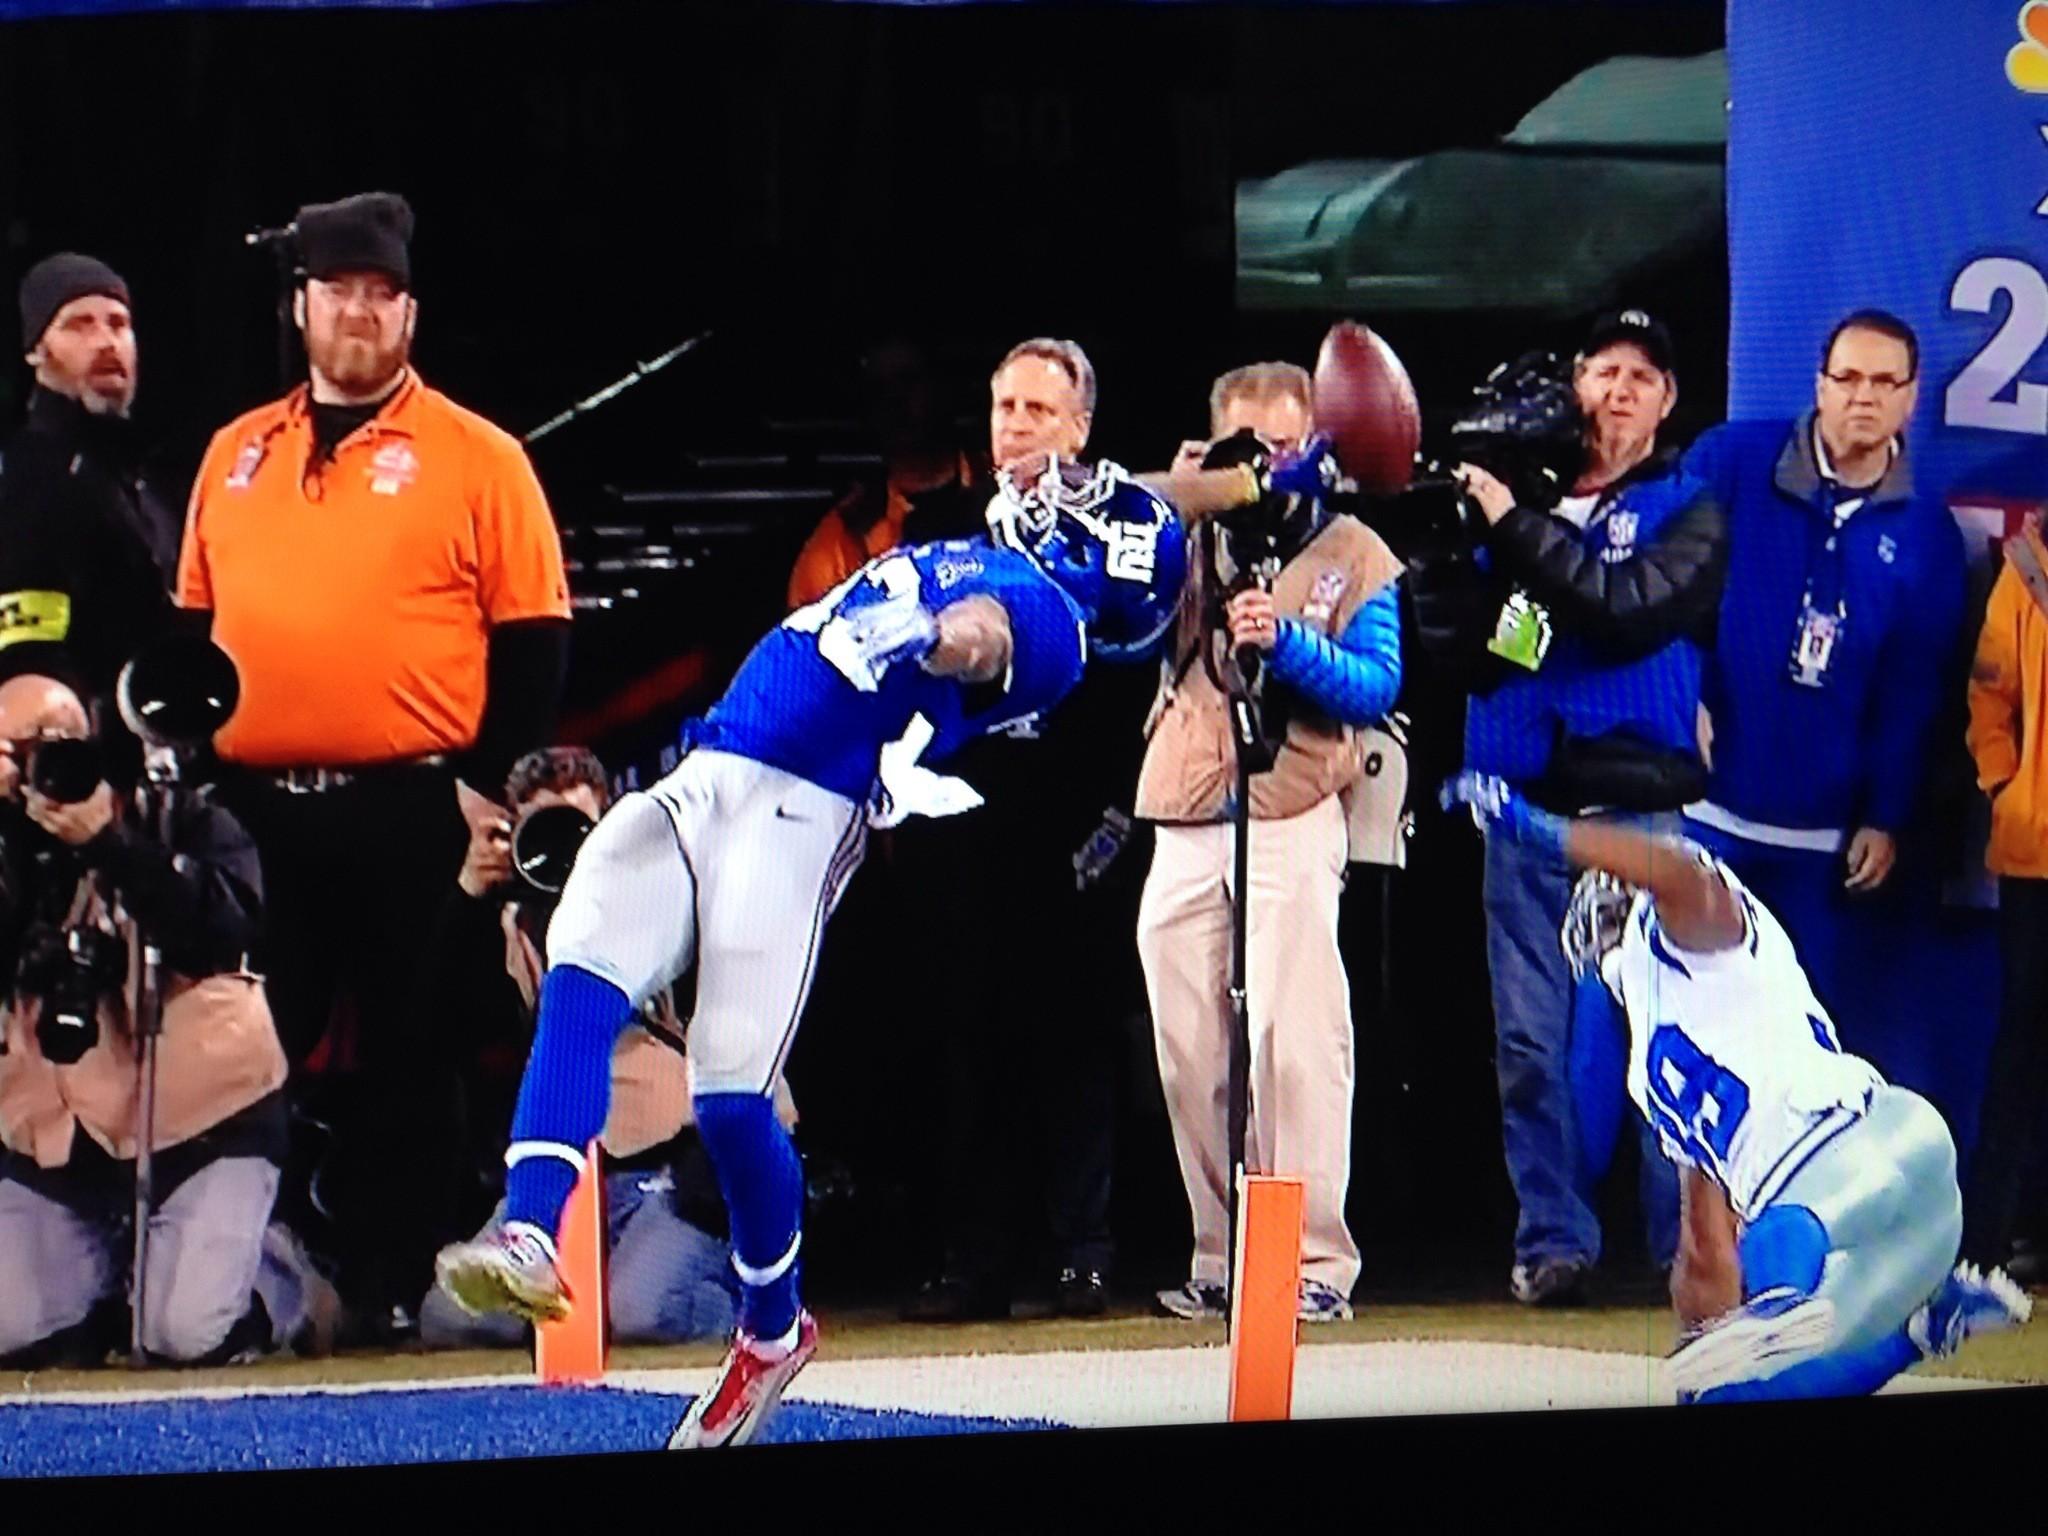 Greatest catch ever!?